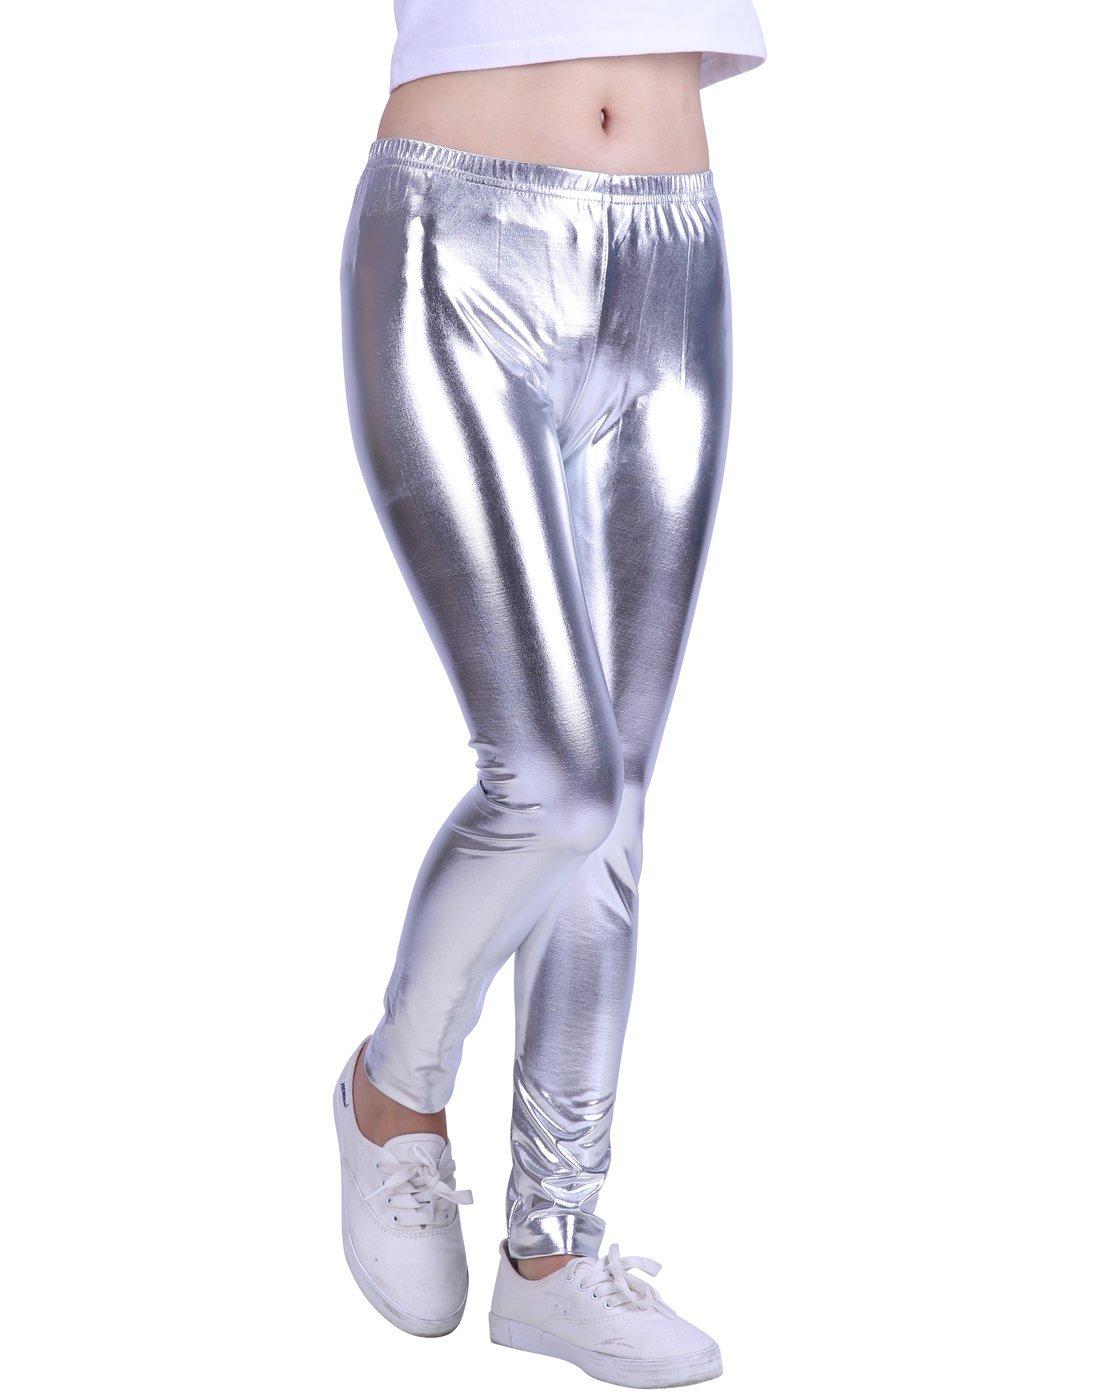 HDE Girls Shiny Wet Look Leggings Kids Liquid Metallic Footless Tights (4T-12) (Silver, 4/5)